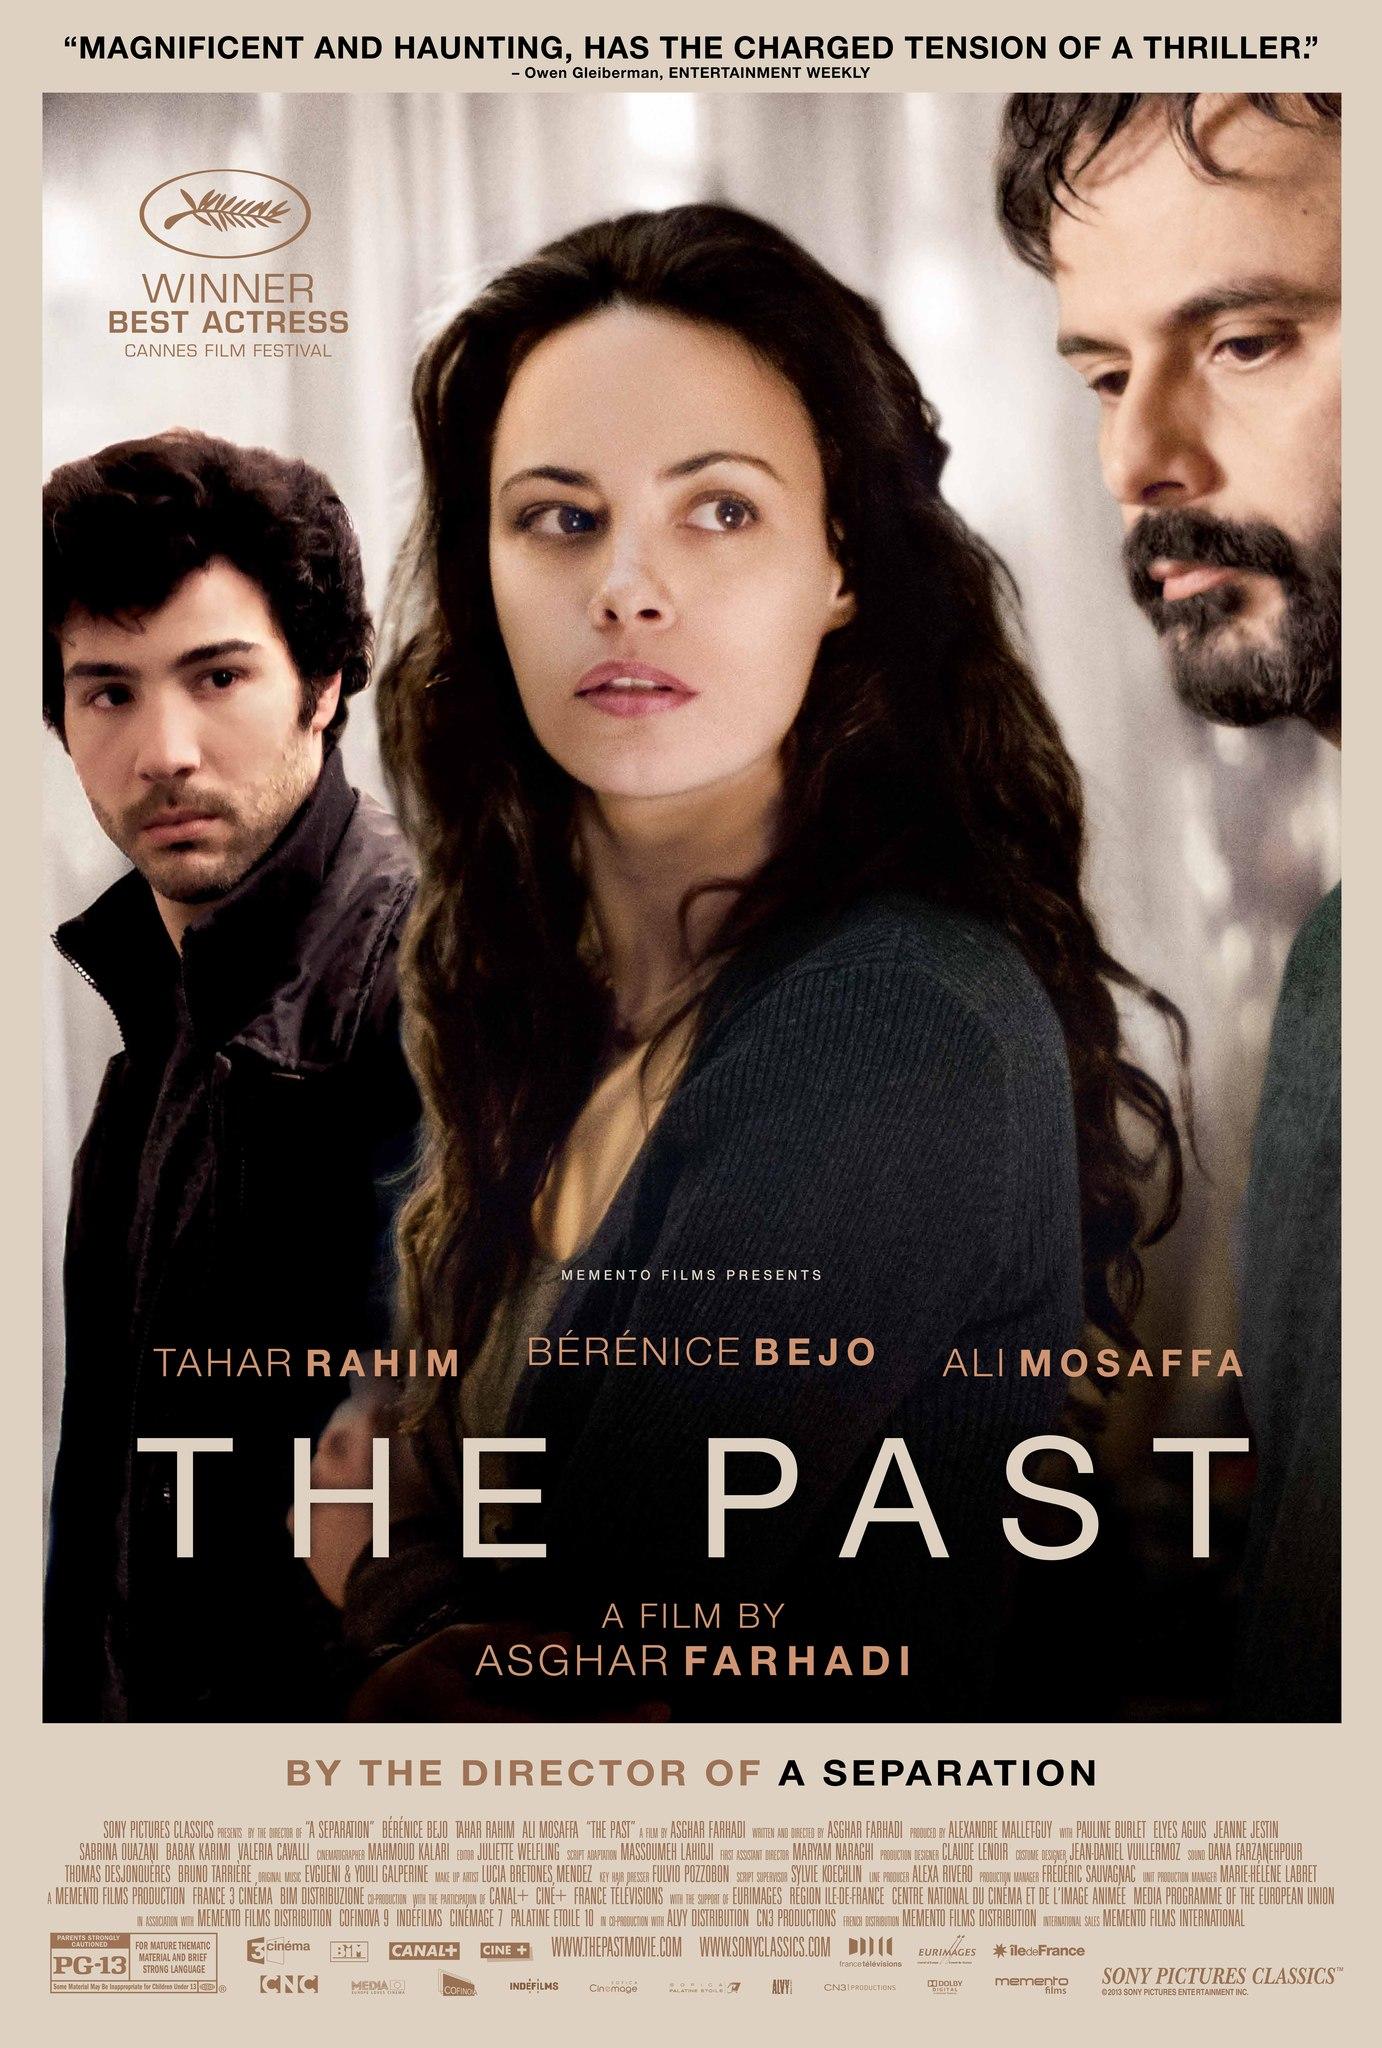 Le Passe - Asgar Farhadi.jpg